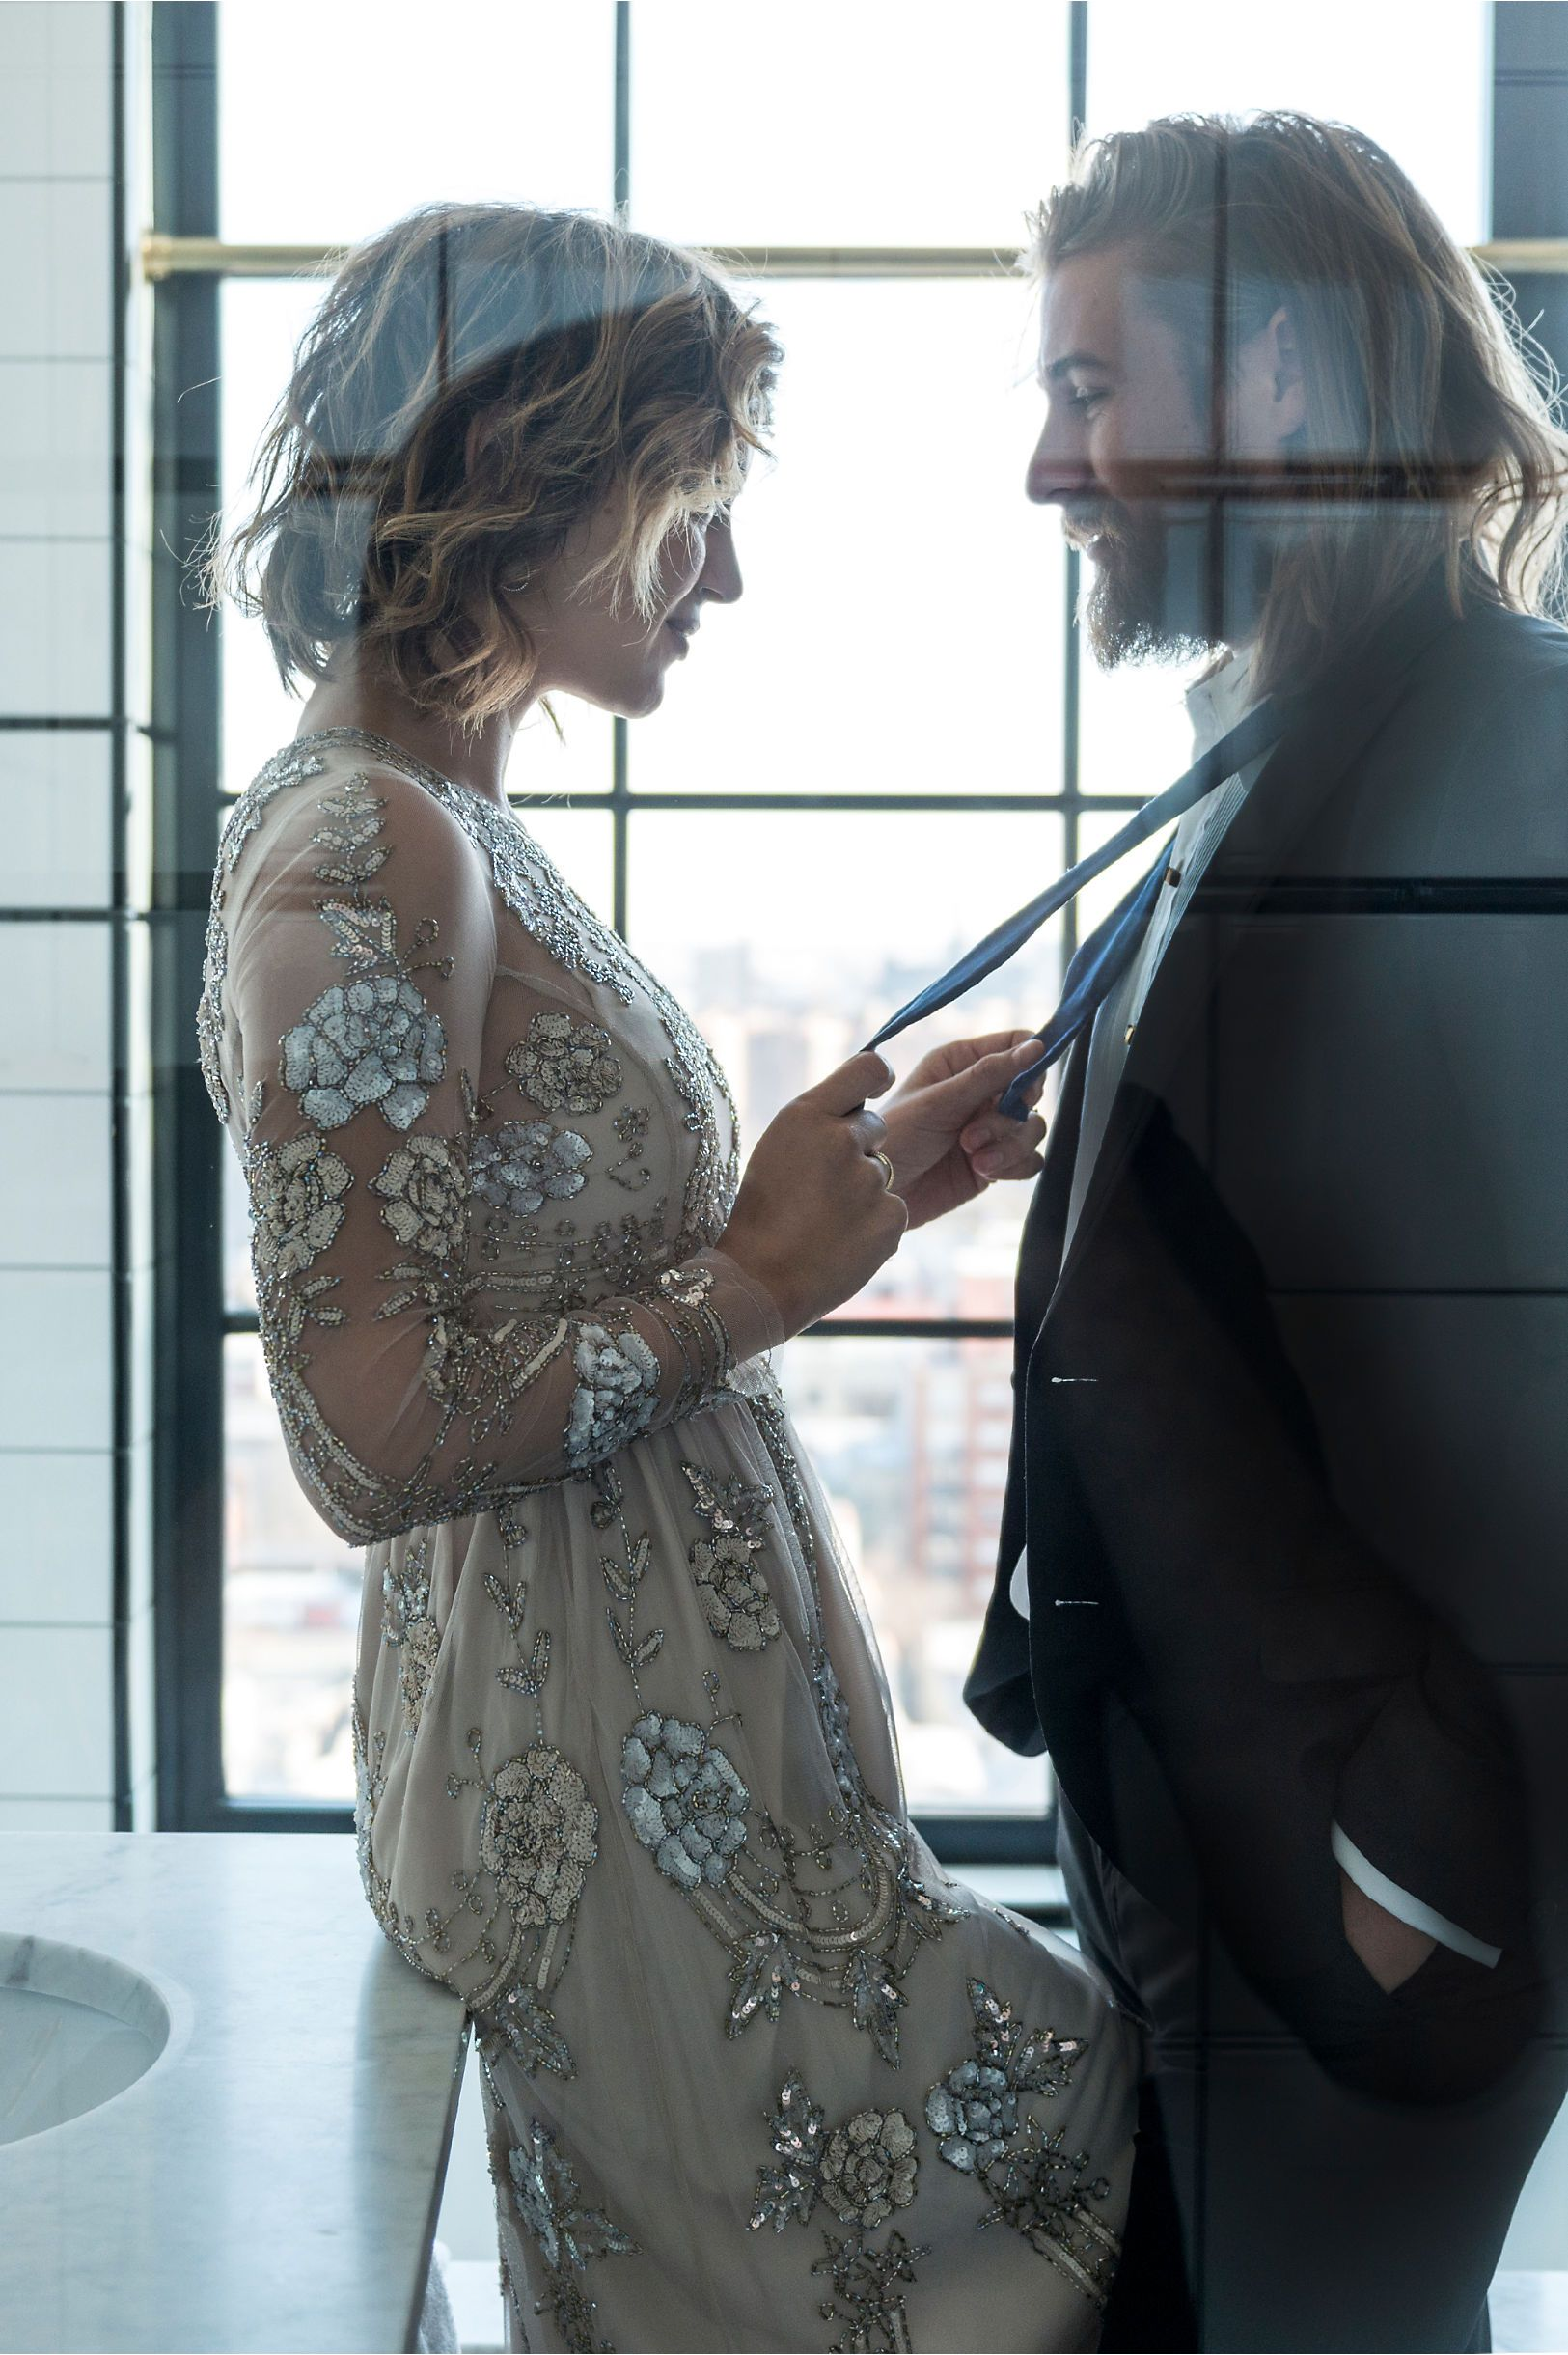 Cute wedding reception dresses for the bride  BHLDN Adona Dress in Dresses Party Dresses  BHLDN  hair